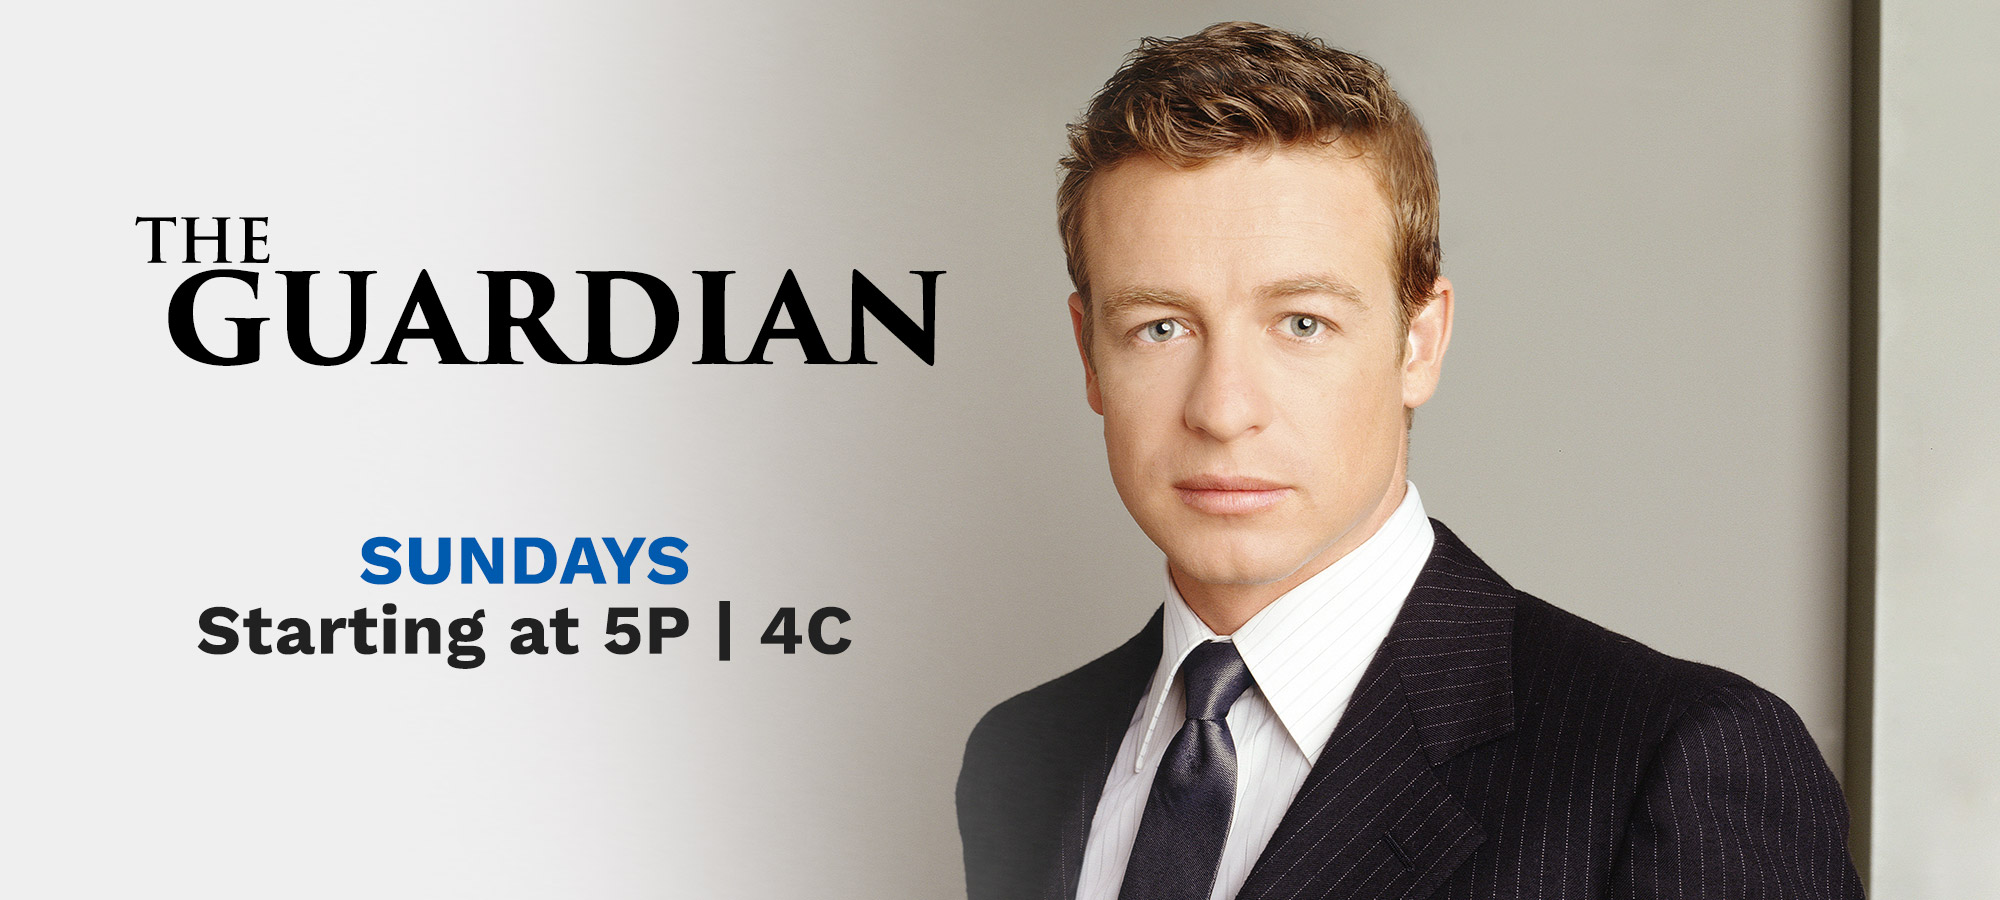 H&I TV Network